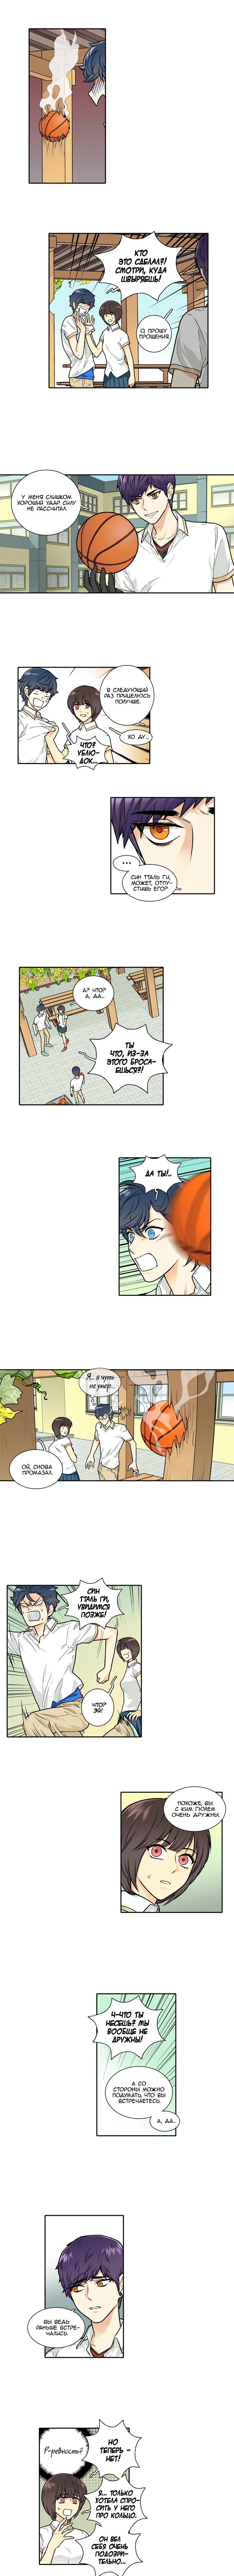 https://r1.ninemanga.com/comics/pic2/41/21609/311732/1477294550465.jpg Page 6